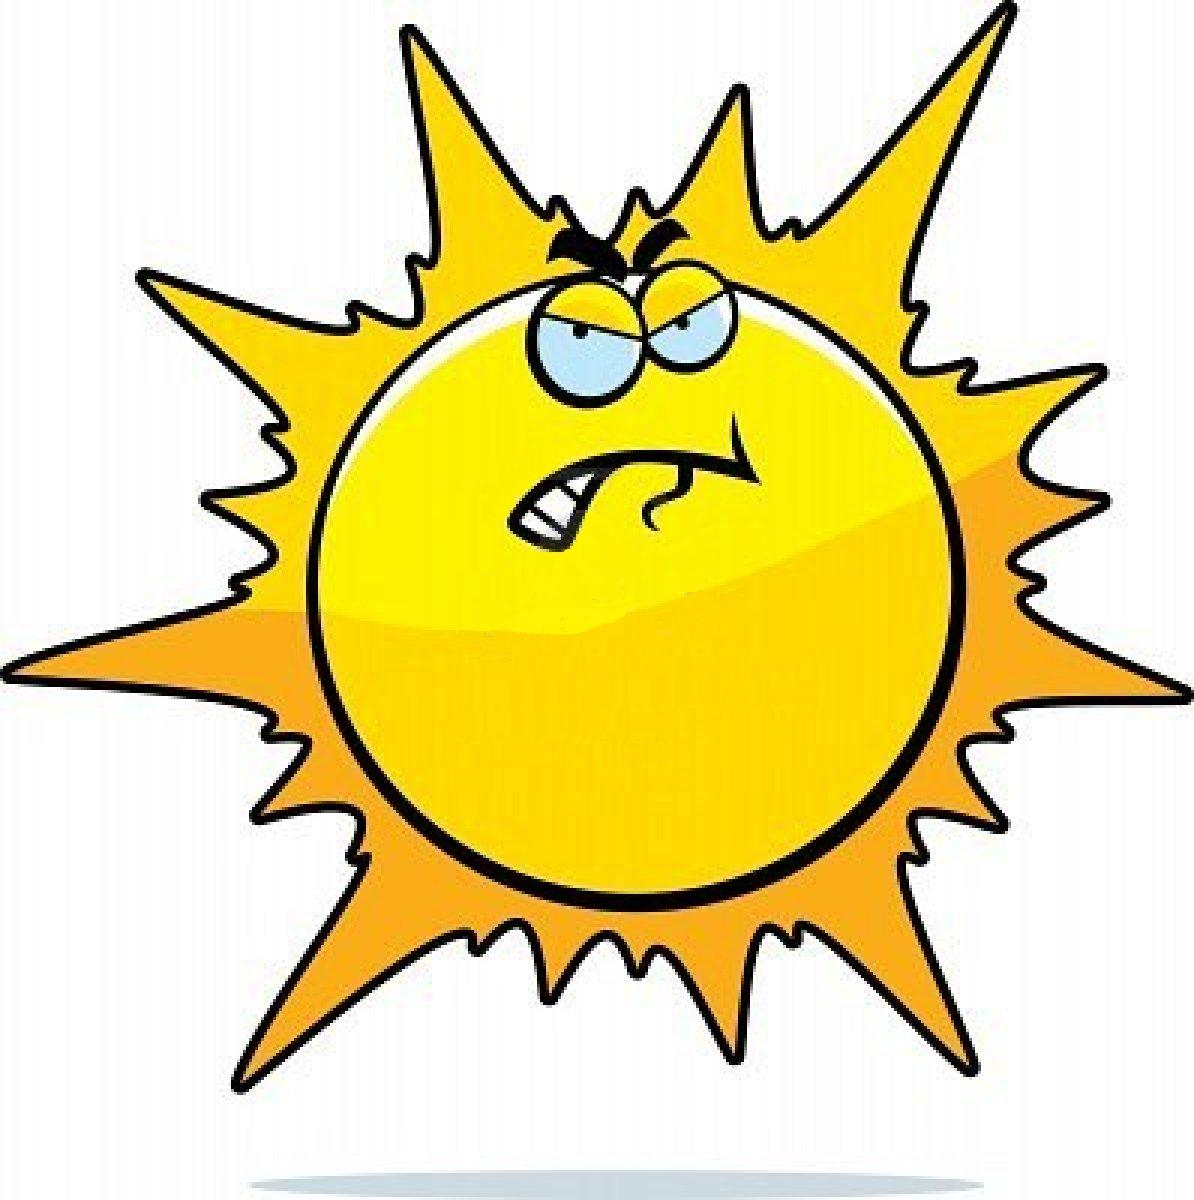 The Sun Cartoon.